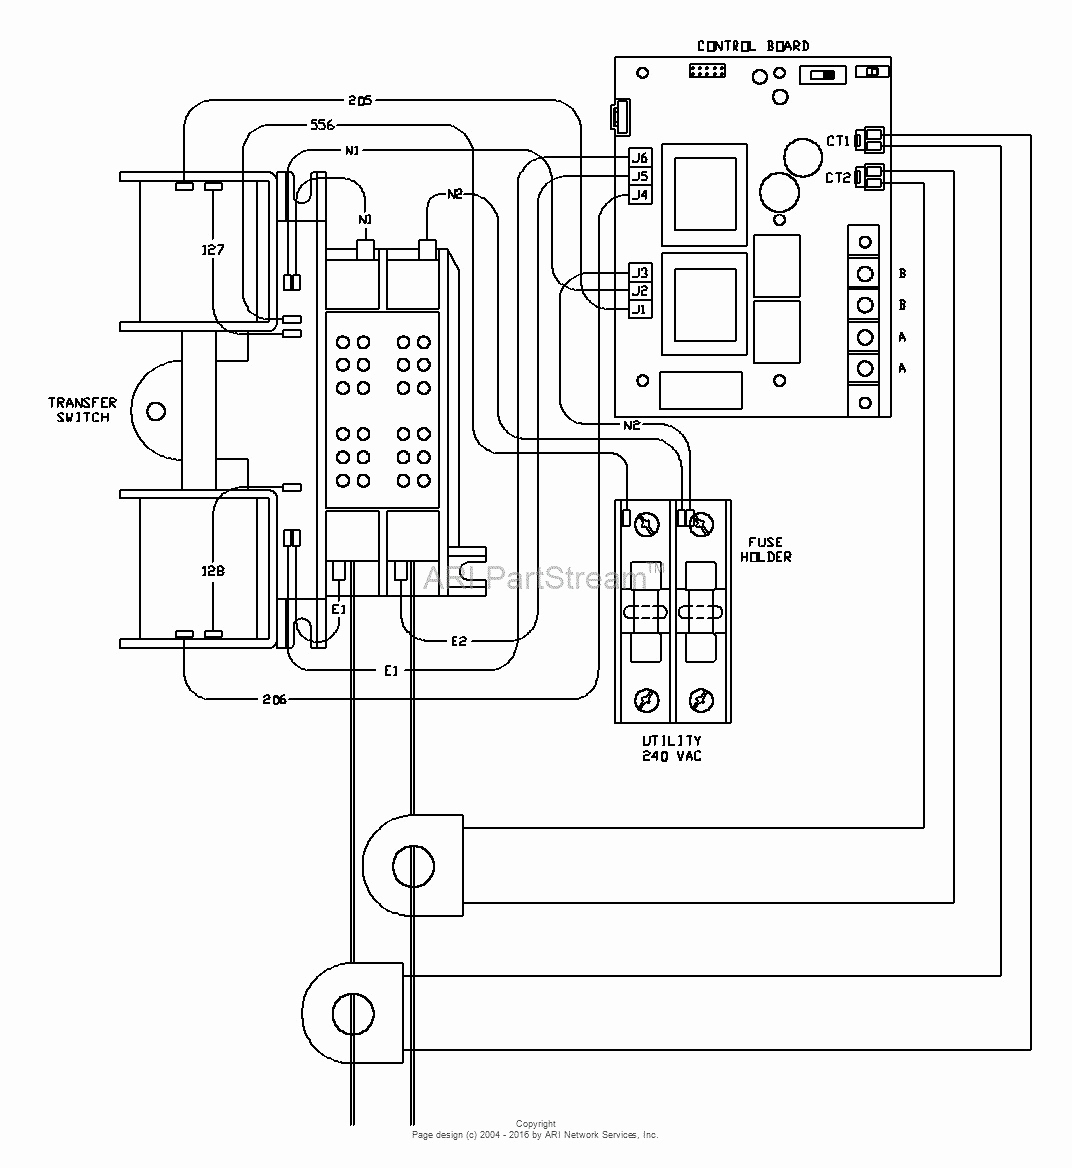 Generac 100 Amp Automatic Transfer Switch Wiring Diagram New Generac - Generac 100 Amp Automatic Transfer Switch Wiring Diagram